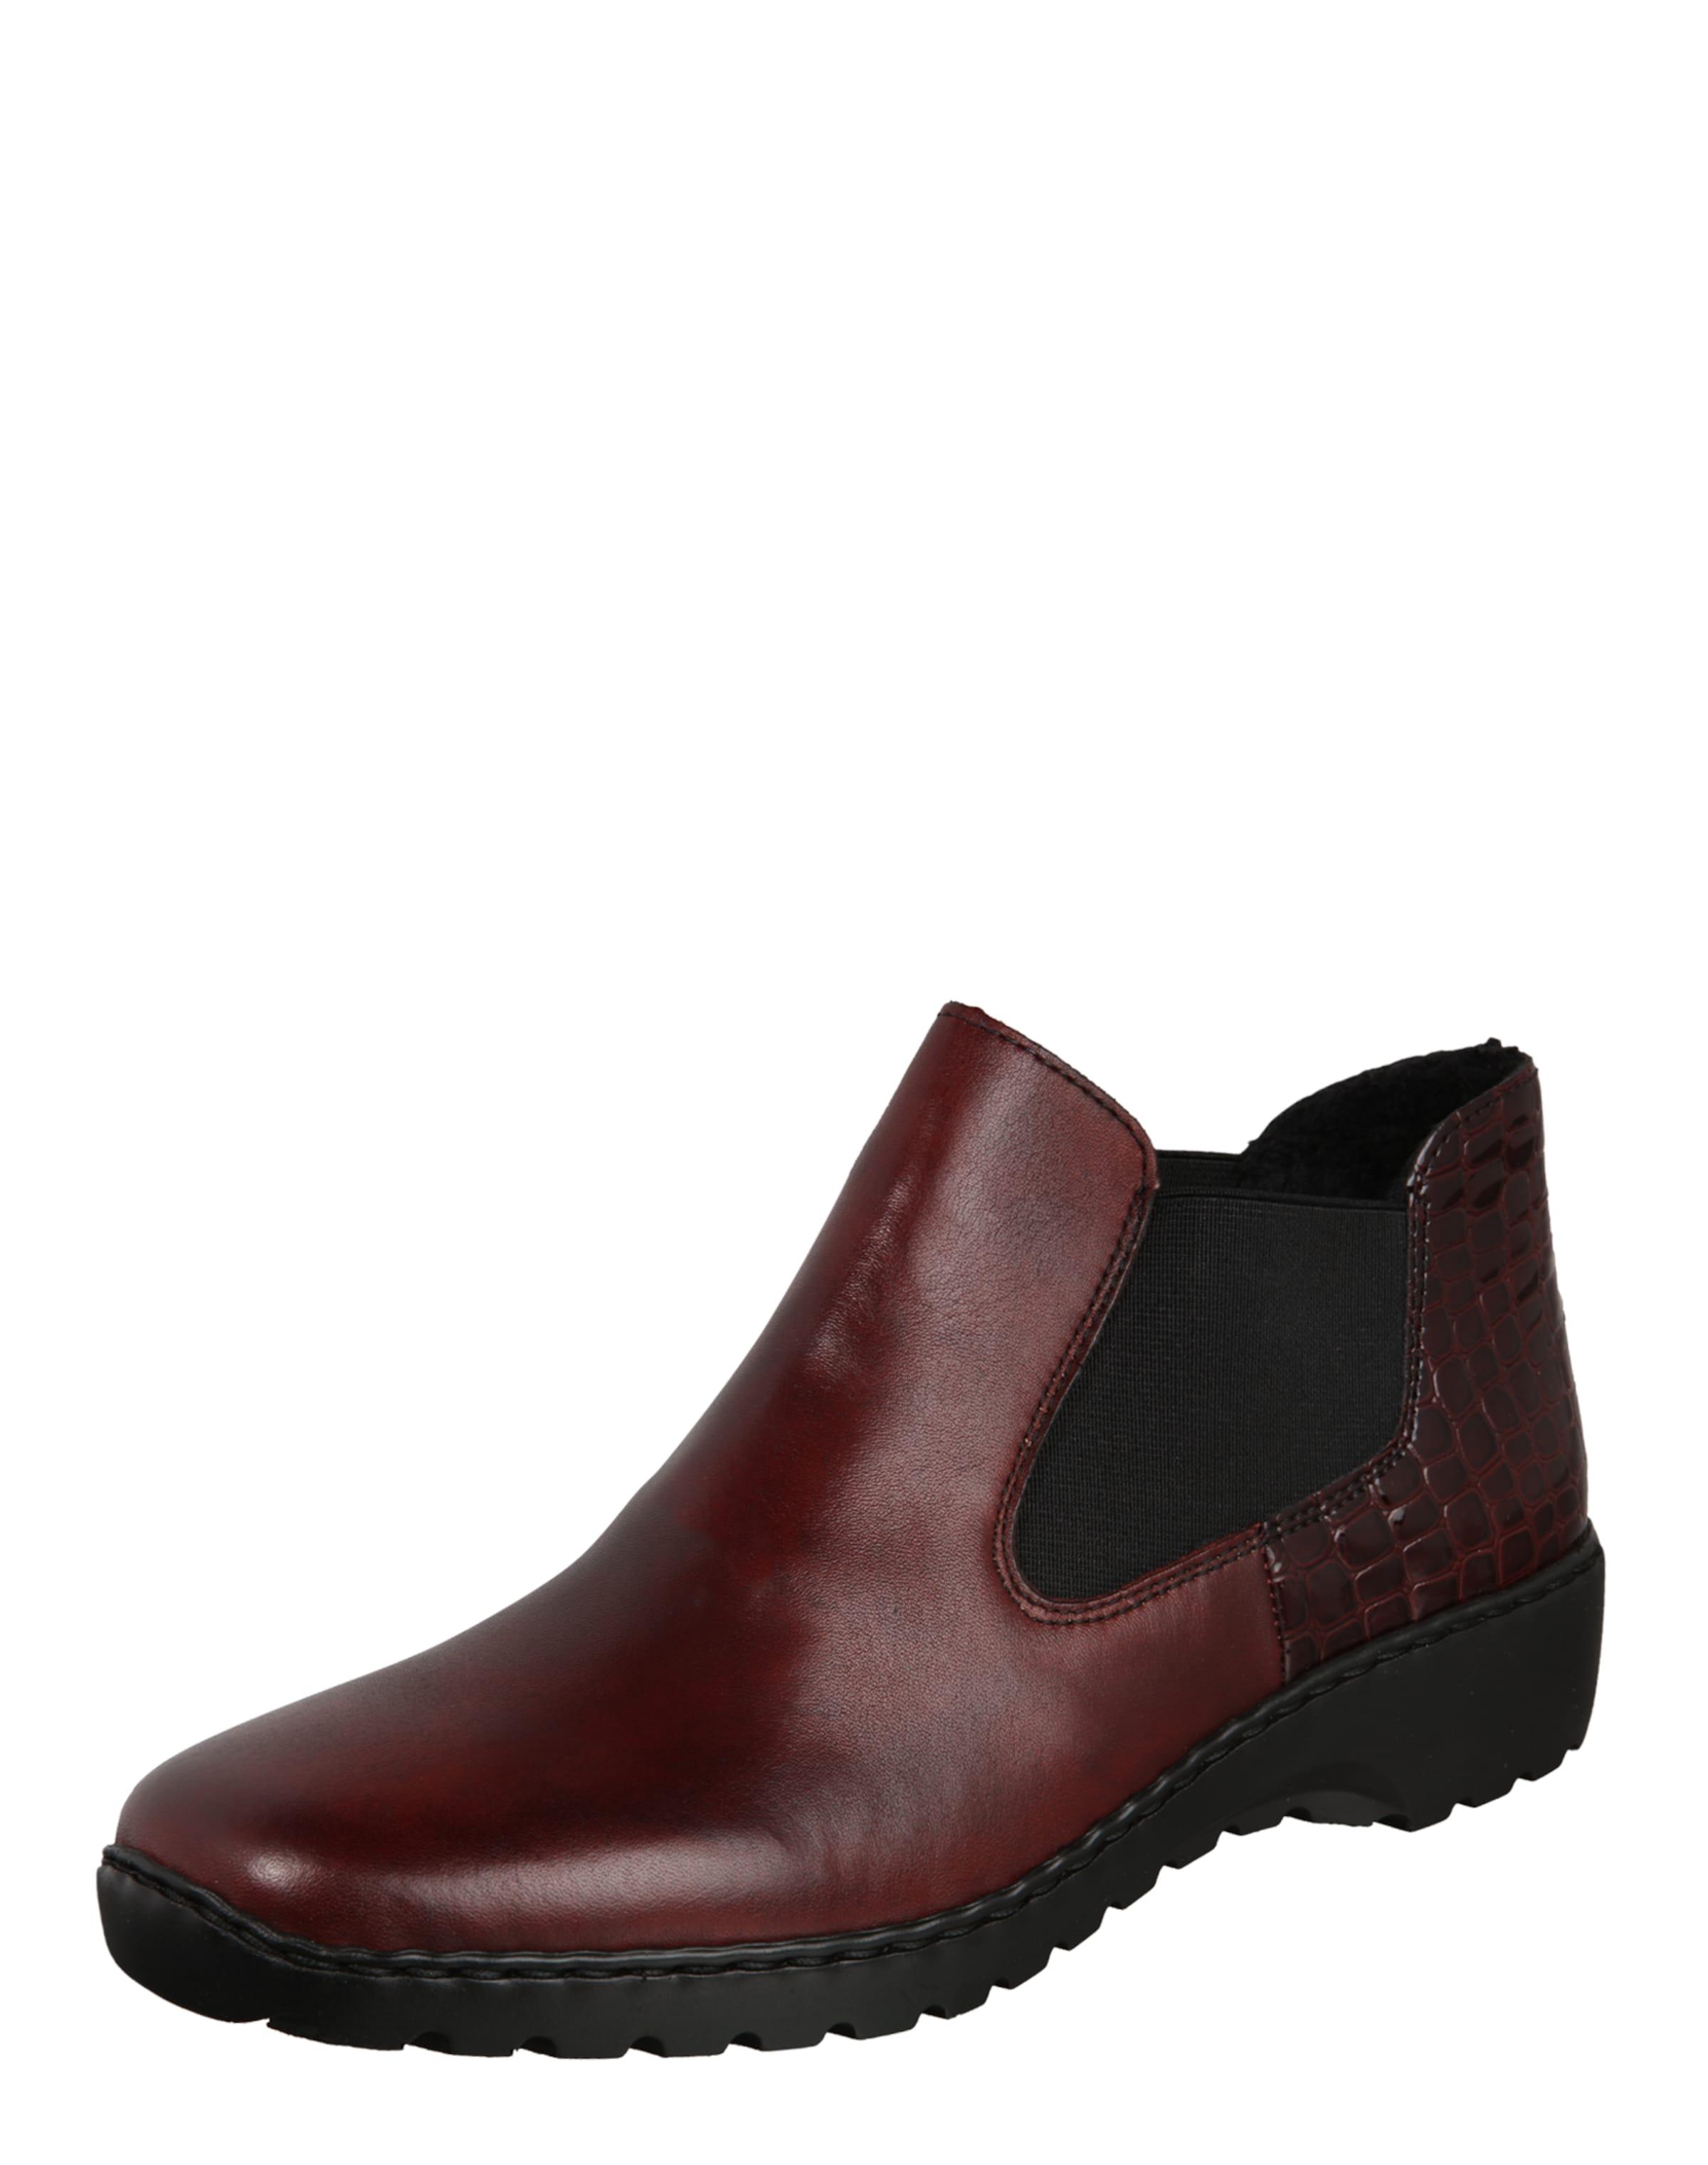 RIEKER Chelsea Boots Günstige und langlebige Schuhe